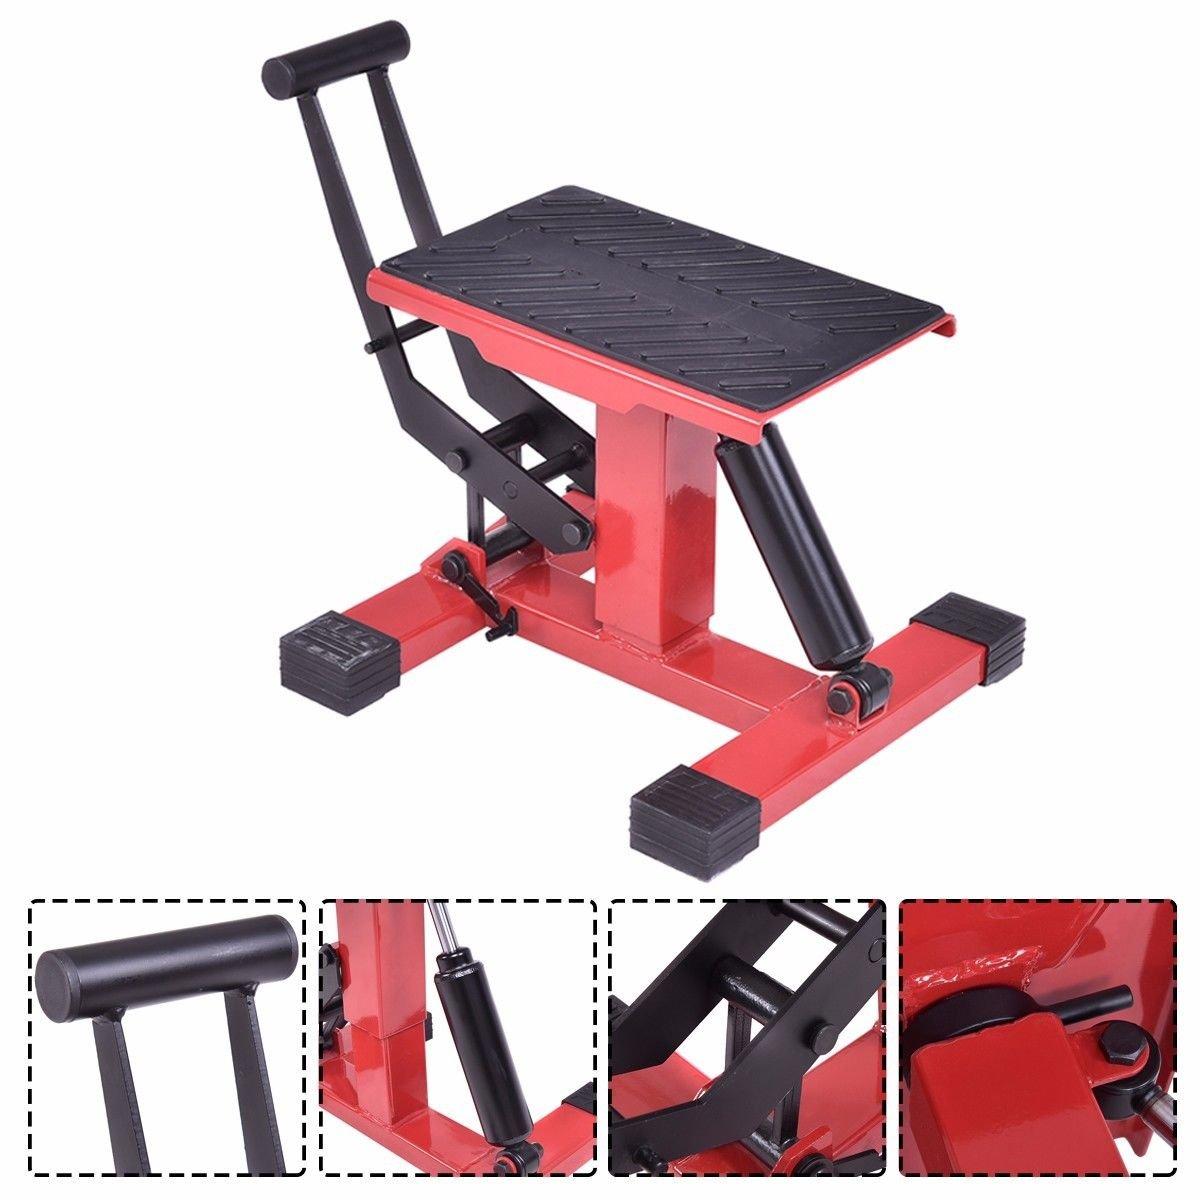 Goplus Hydraulic Motorcycle Dirt Bike Lift Jack Hoist Stand Table Height Adjustable W//Damping